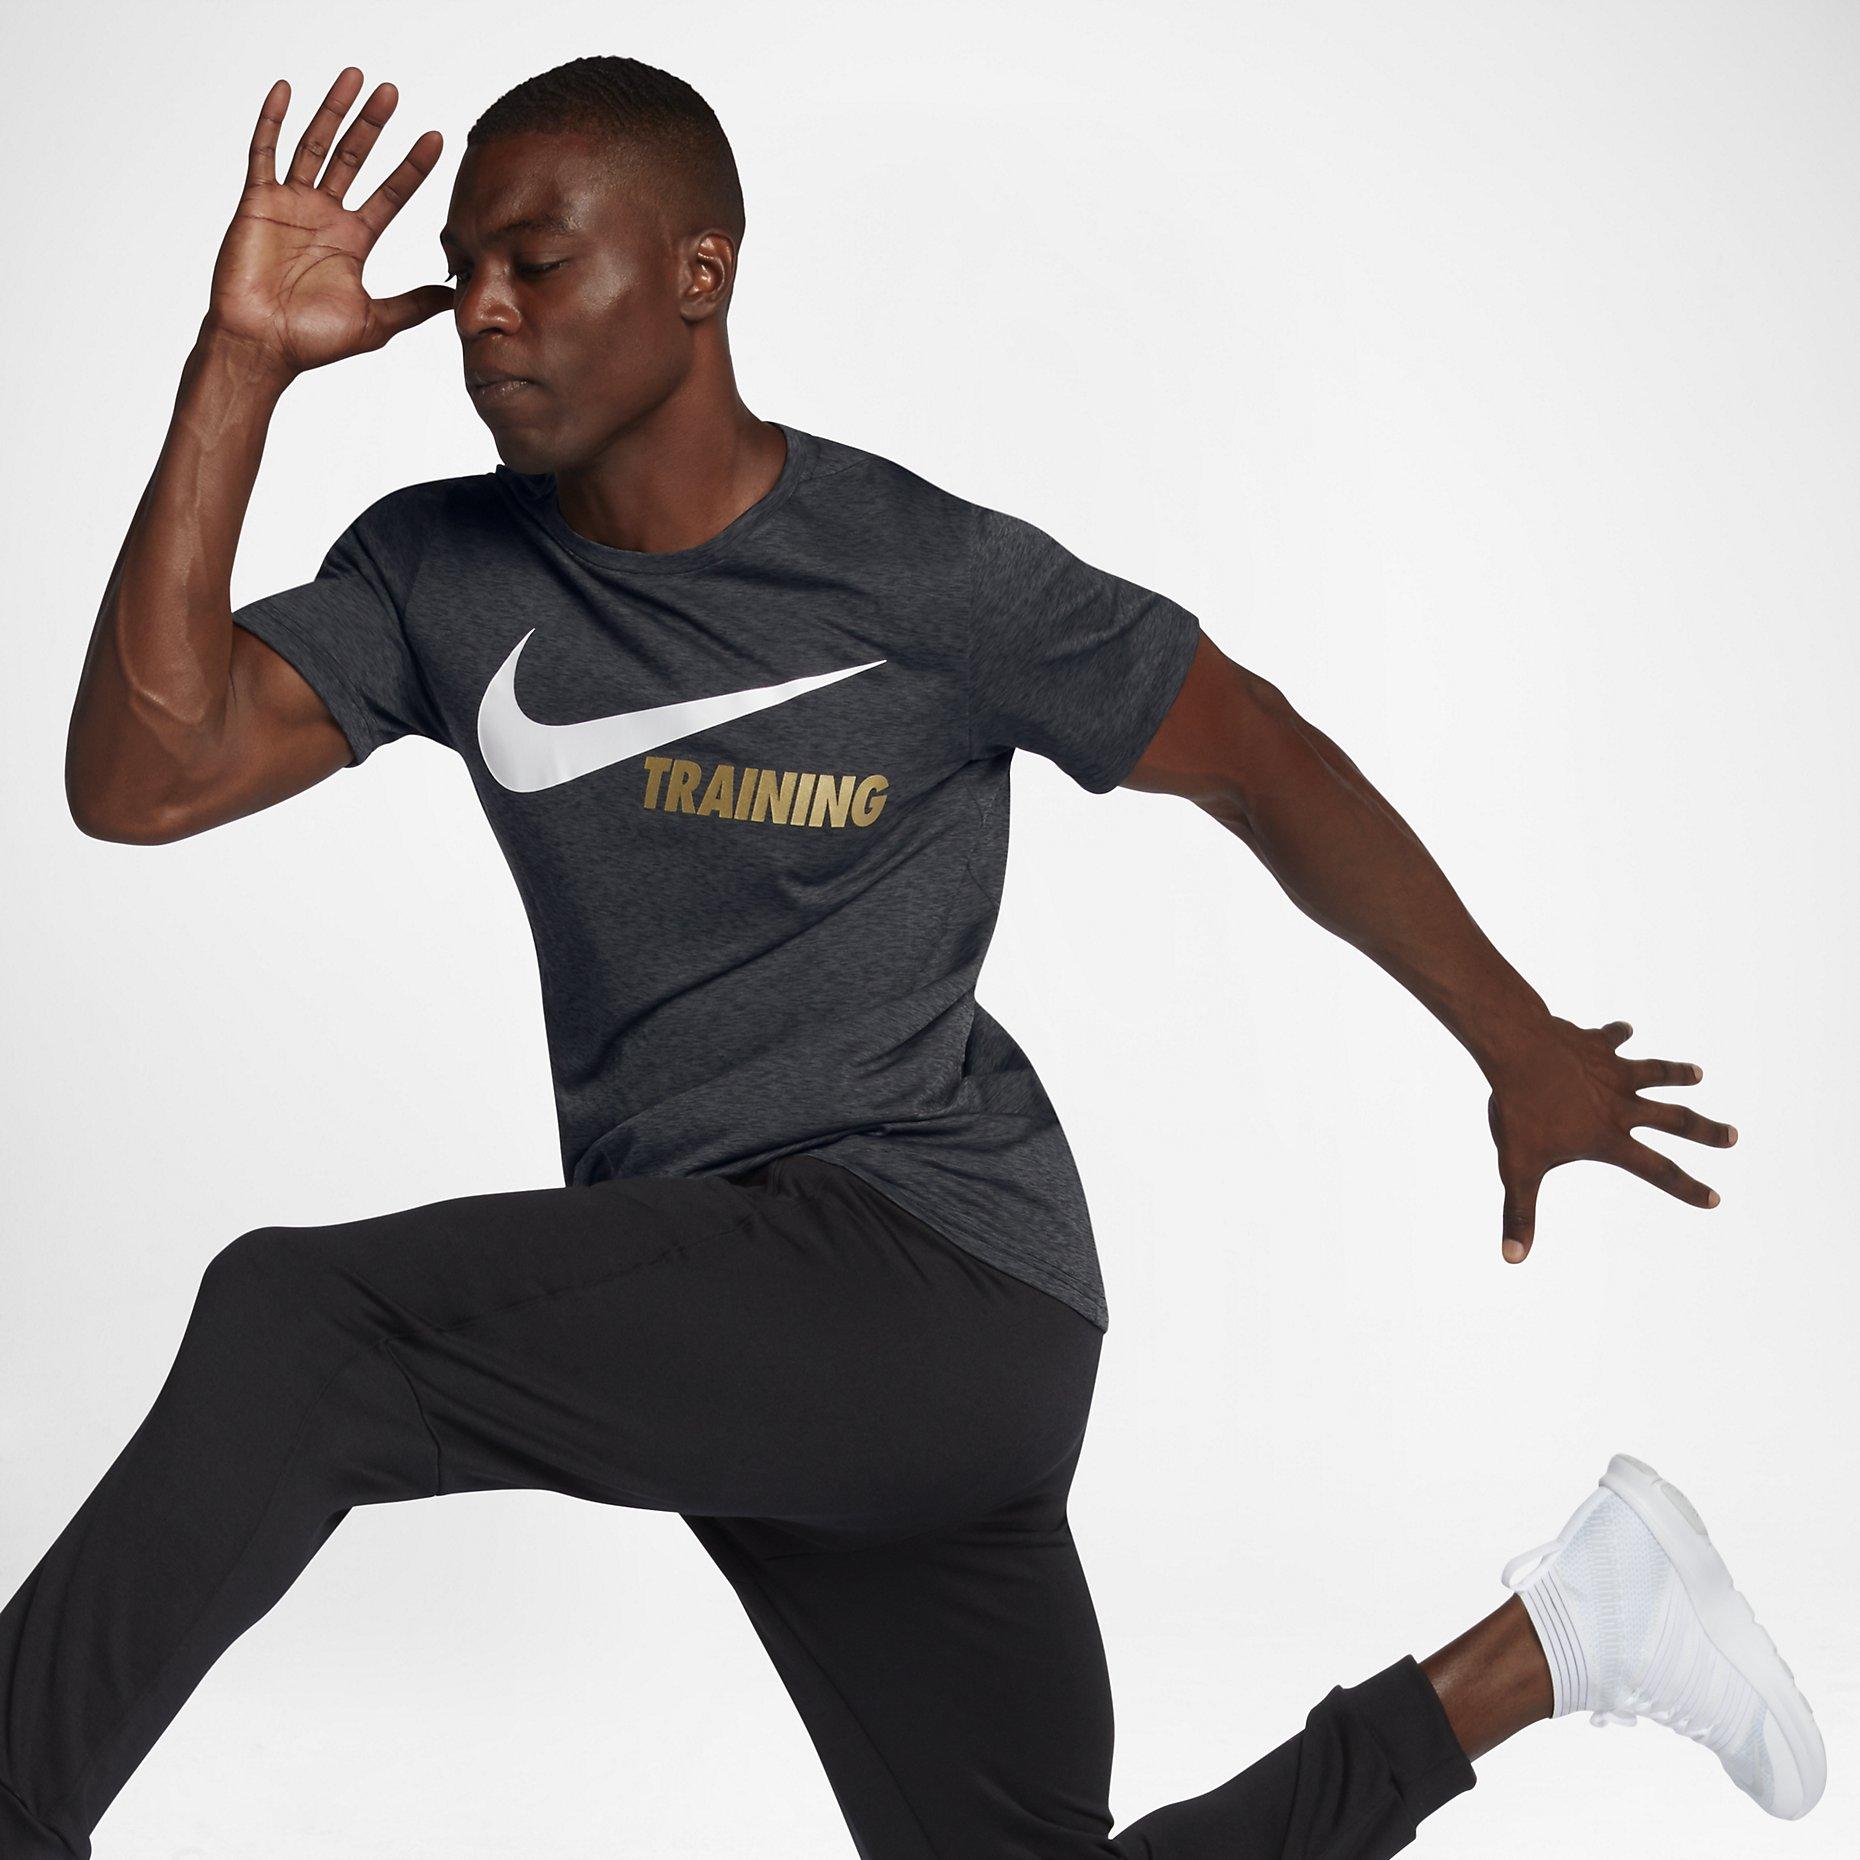 breathe-mens-short-sleeve-training-top